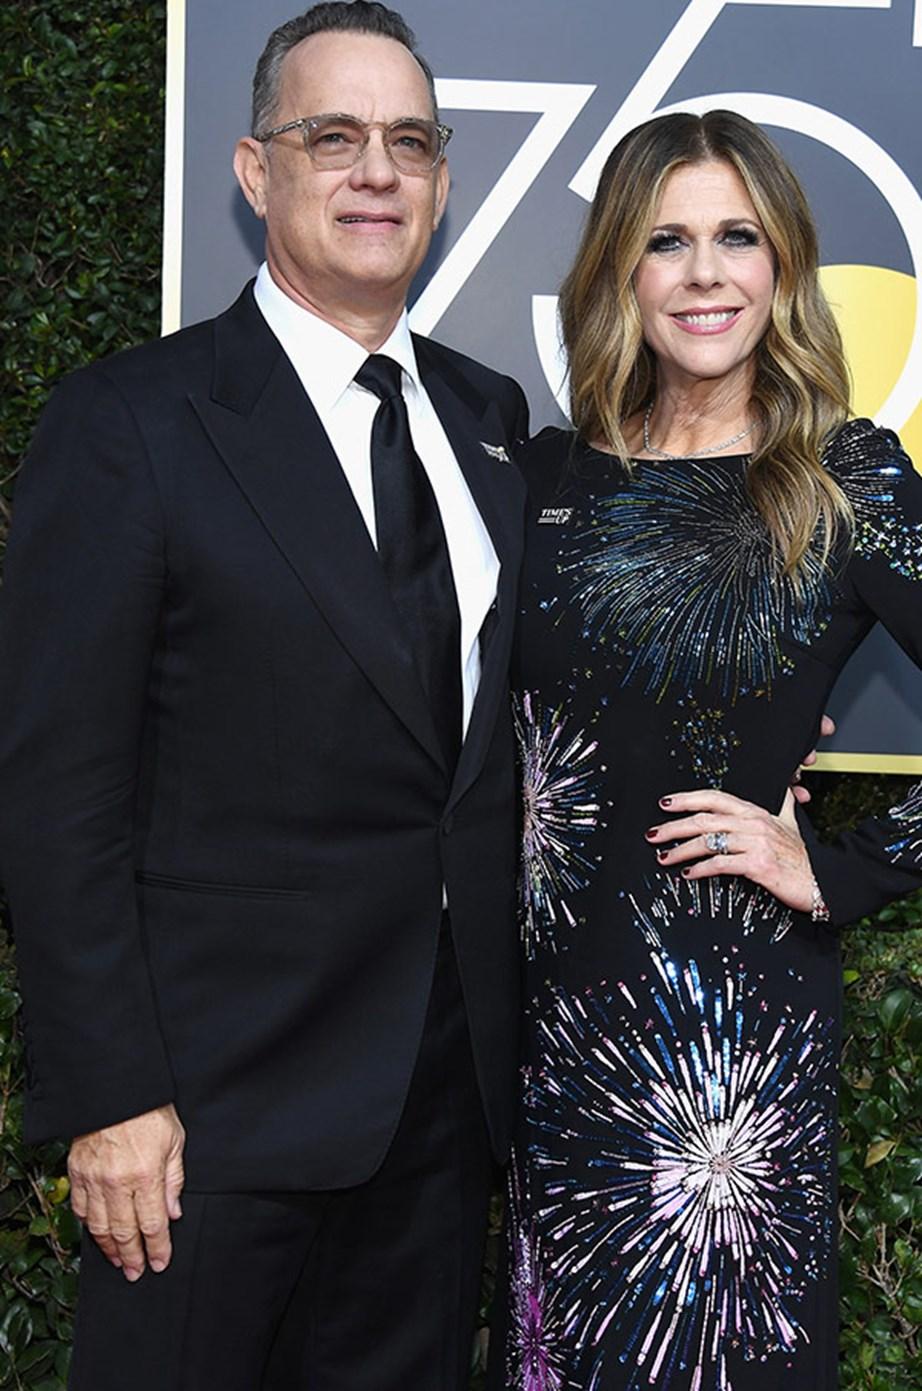 Tom Hanks with his beaming wife Rita Wilson.